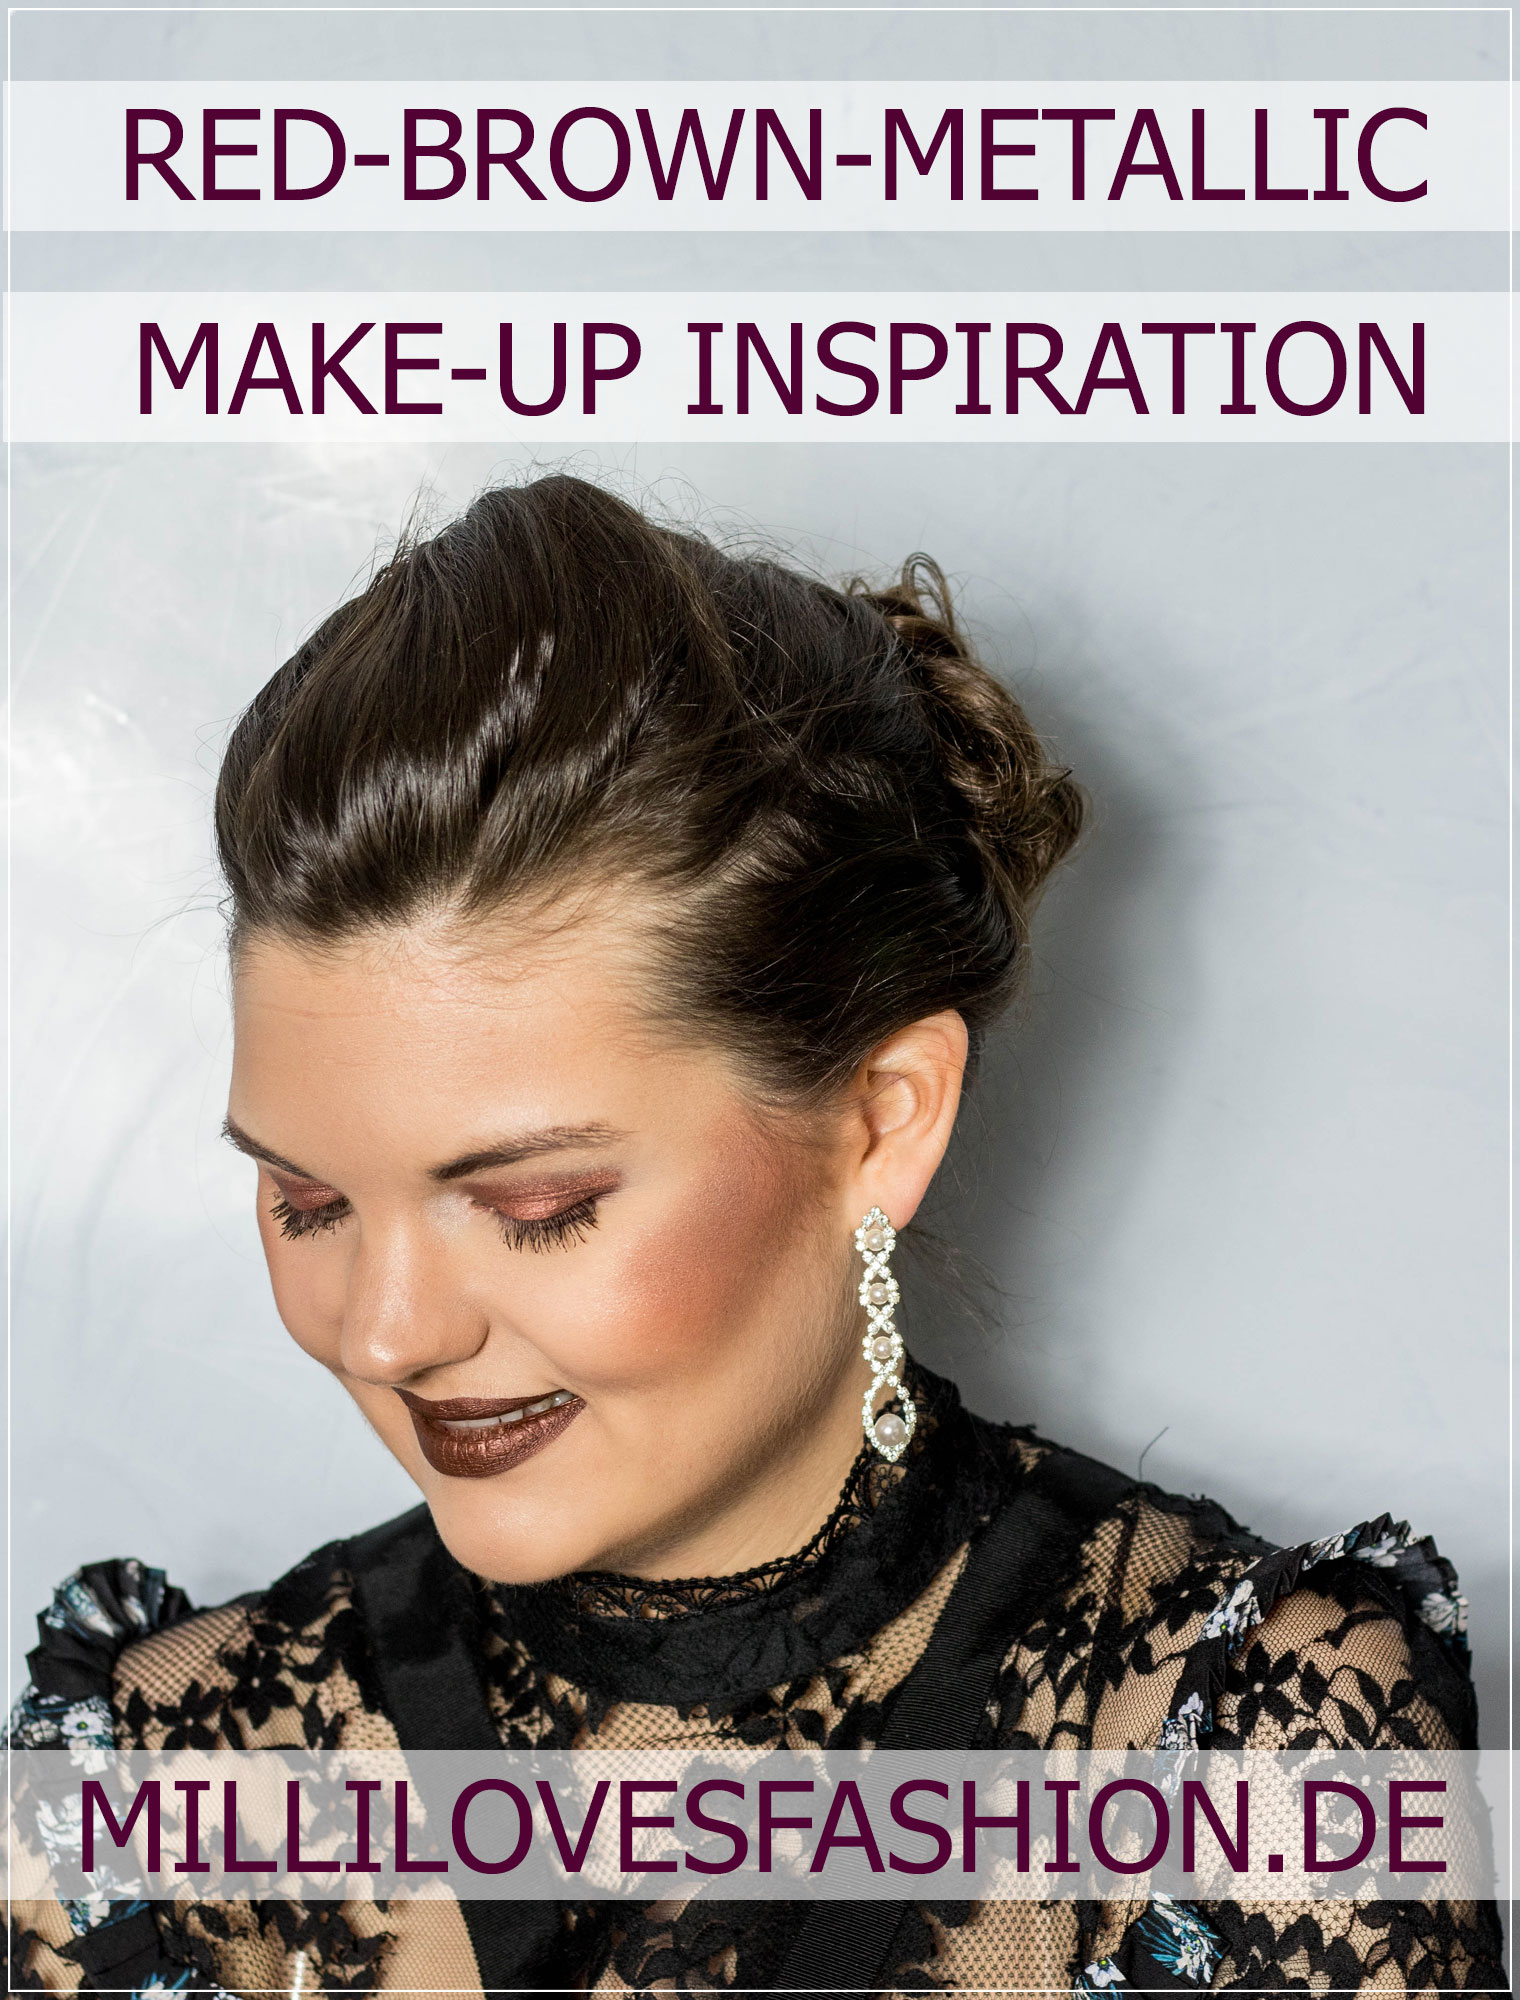 Metallic-Make-Up, Abendmahl-up, Naked Heat Tutorial, Naked Heat Palette, Beautytutorial, Make-up Tutorial, Beauty Blog, Beautybloggerin, Ruhrgebiet